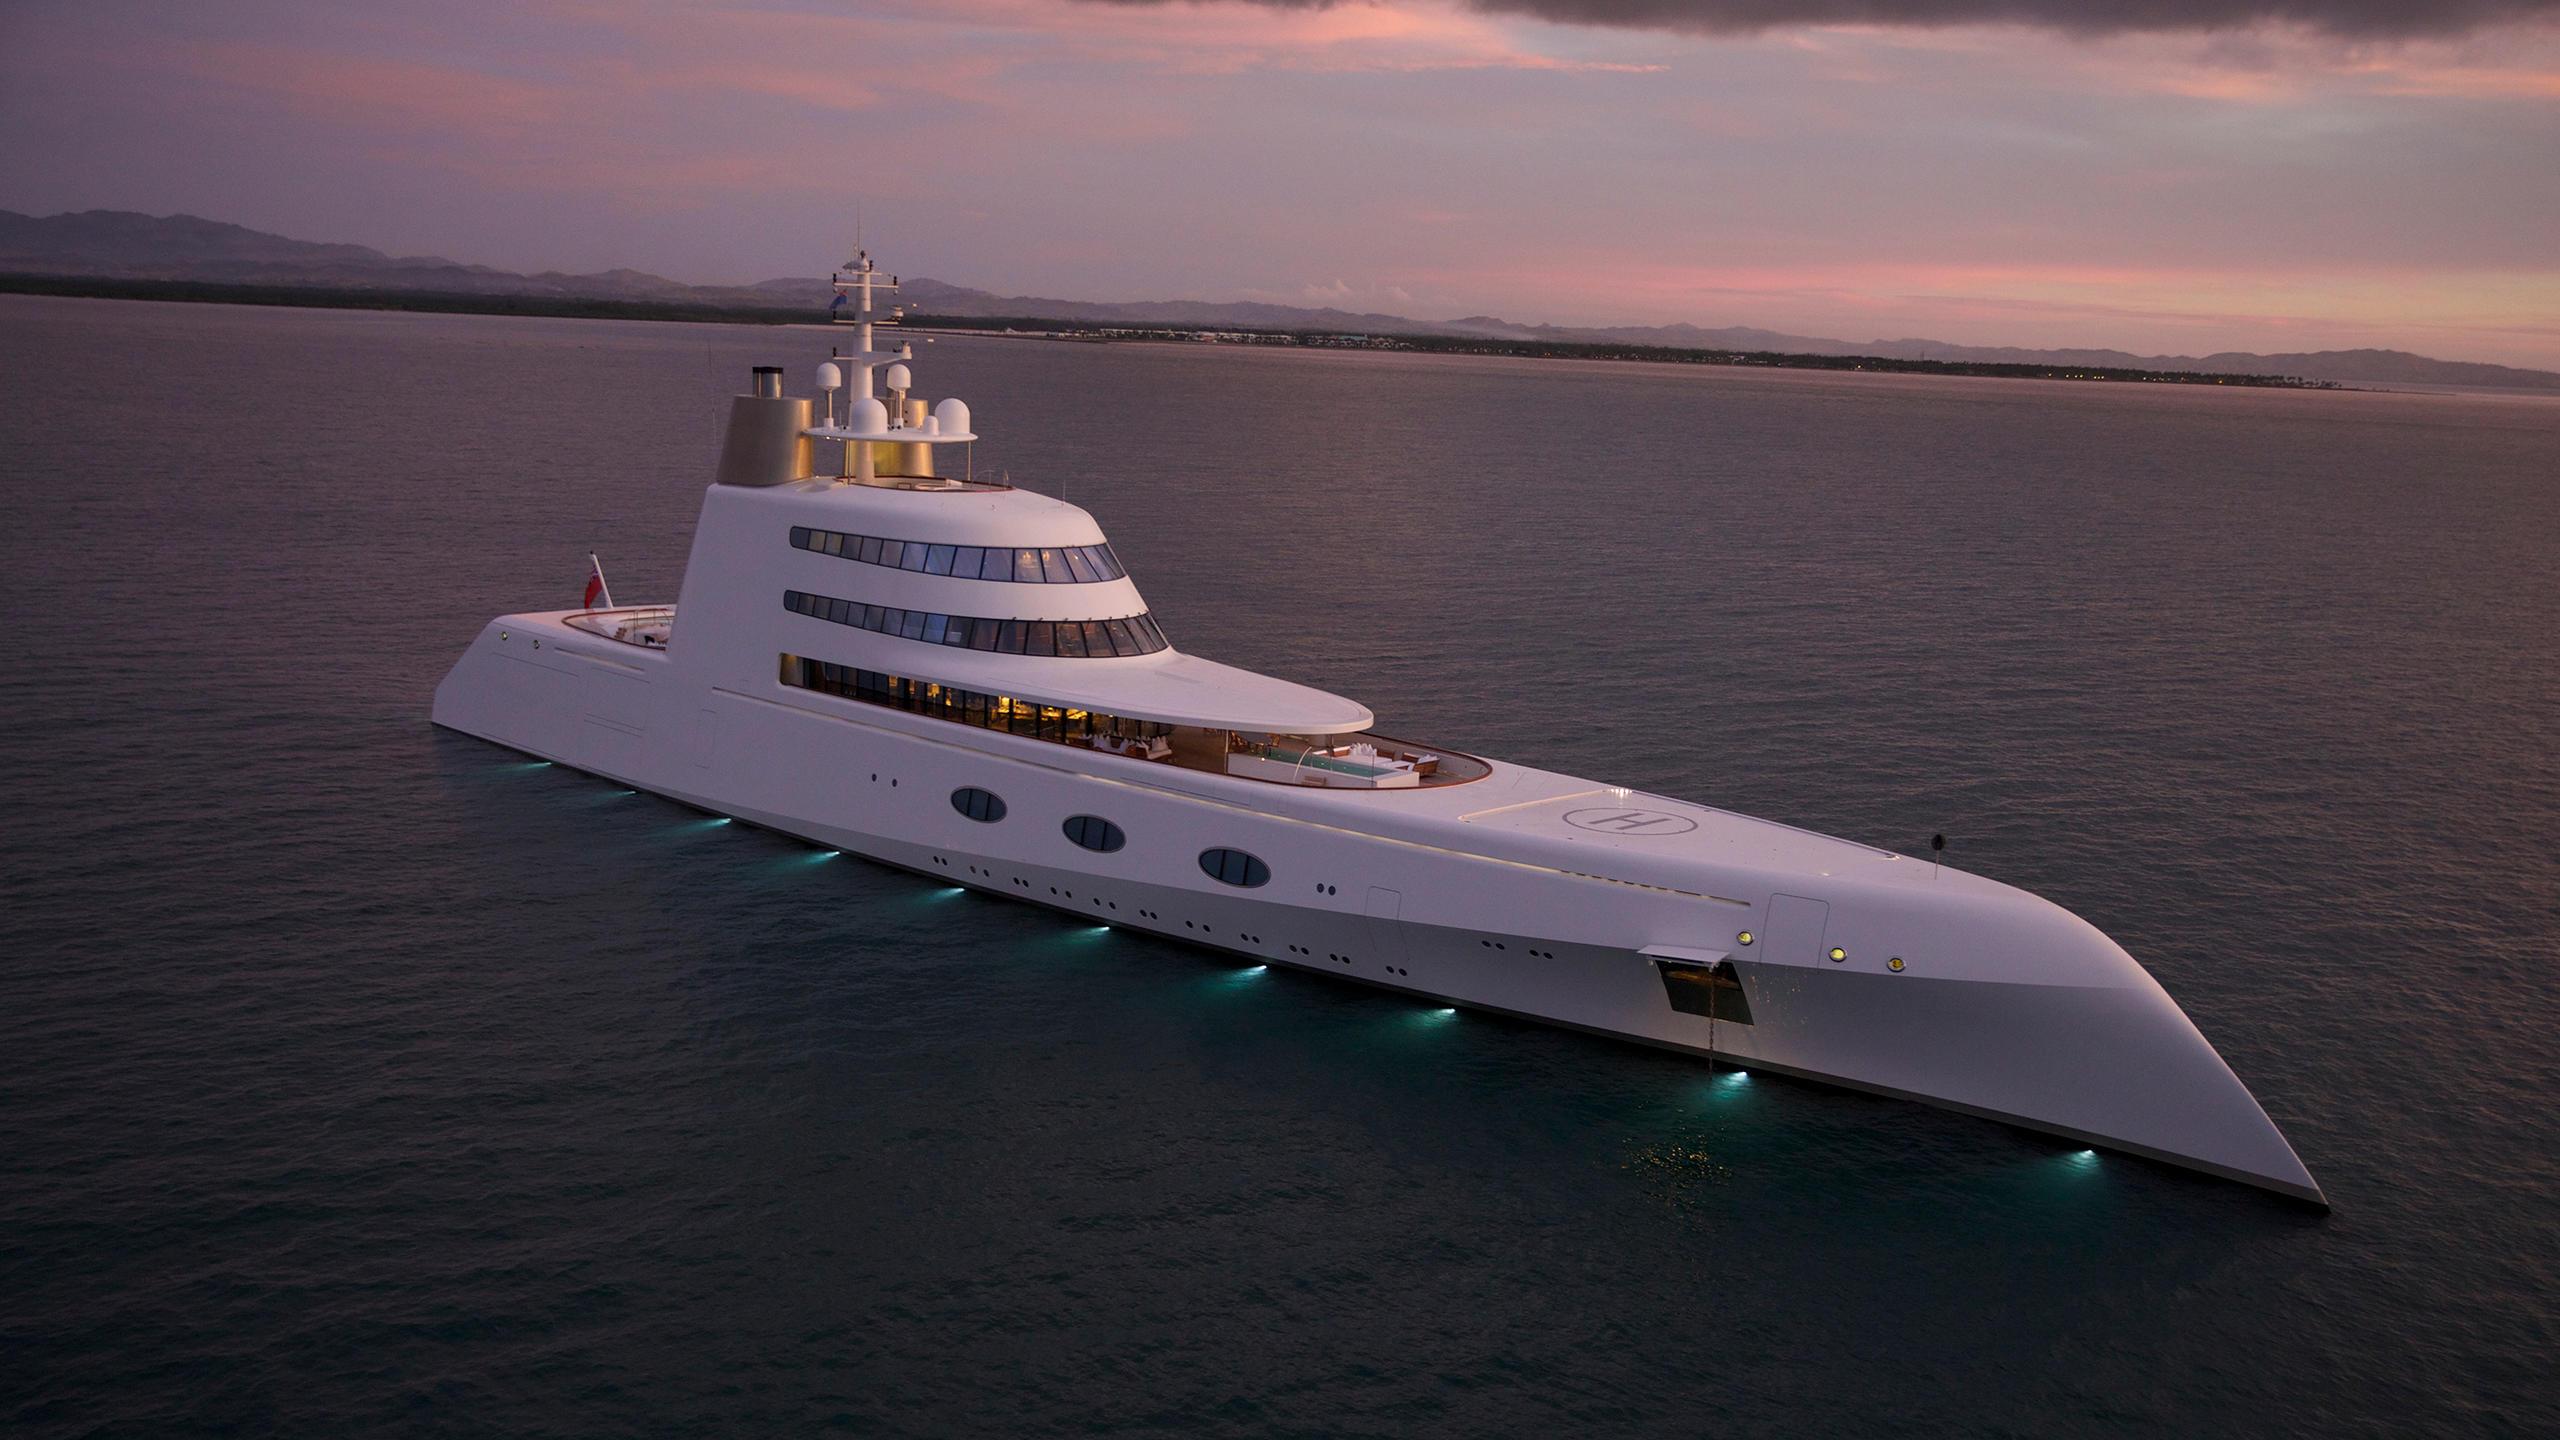 ENhy6B52TC2AzjrKYo0G_motor-yacht-a-sunset-2560x1440 Incroyable De Salon Jardin Fer forgé Schème